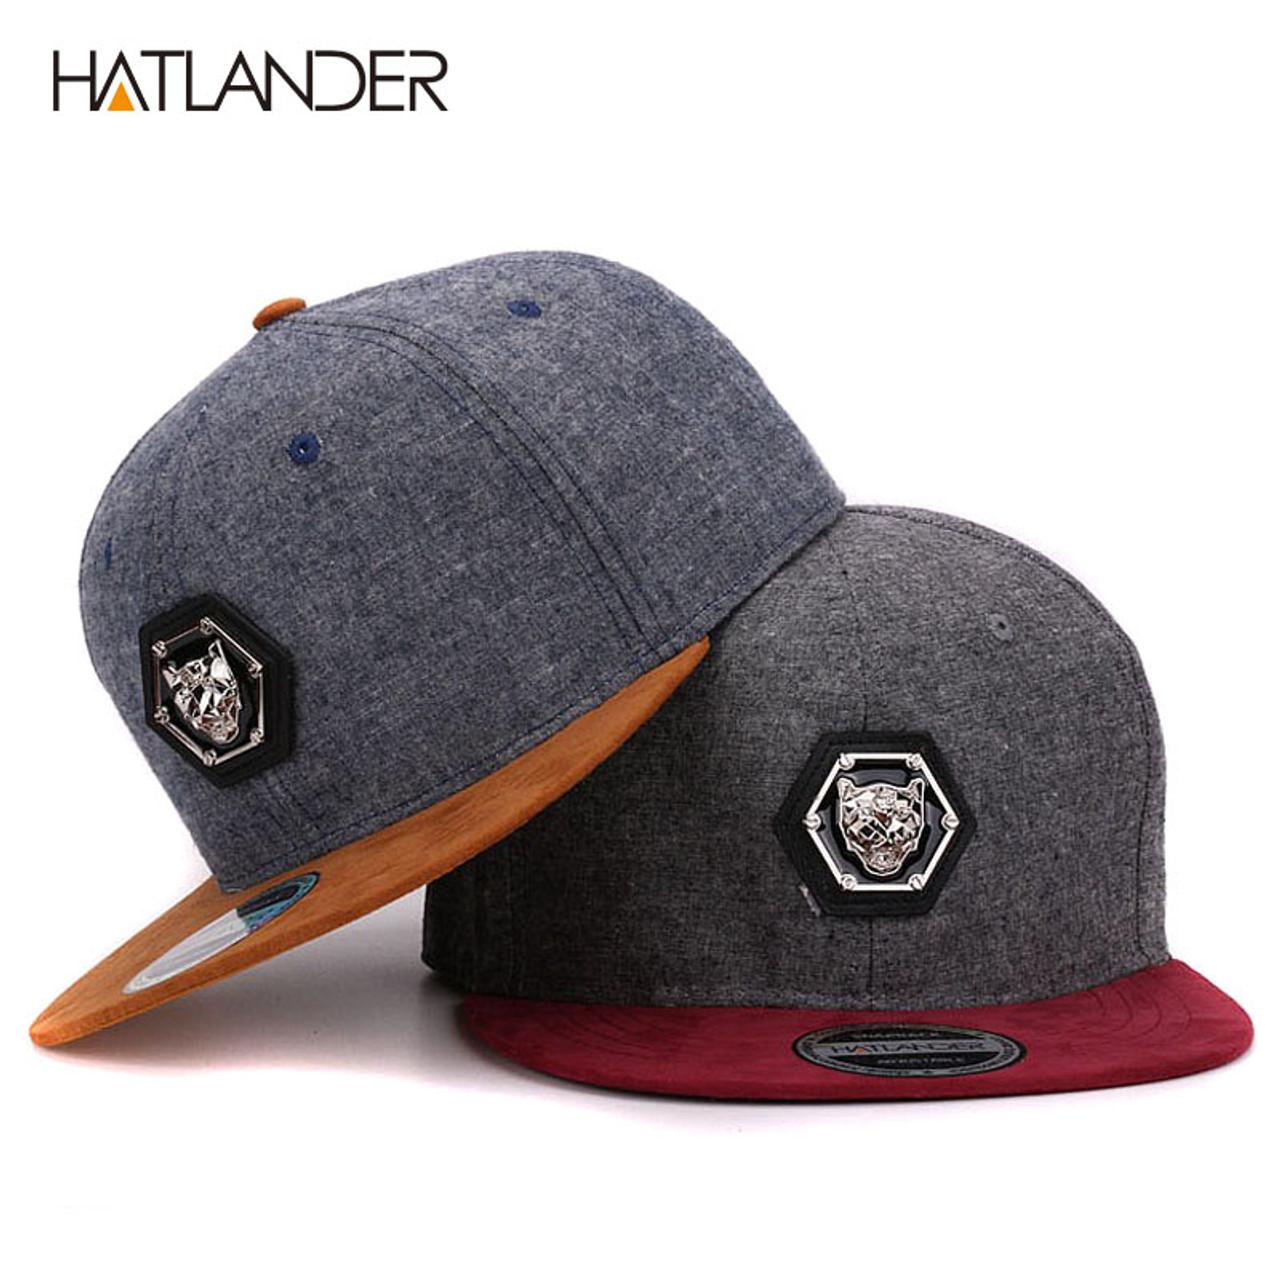 75822ada178 HATLANDER branded adjustable baseball caps women Kpop hip hop cap outdoor  flat brim mens hats gorras planas snapbacks for adult - OnshopDeals.Com